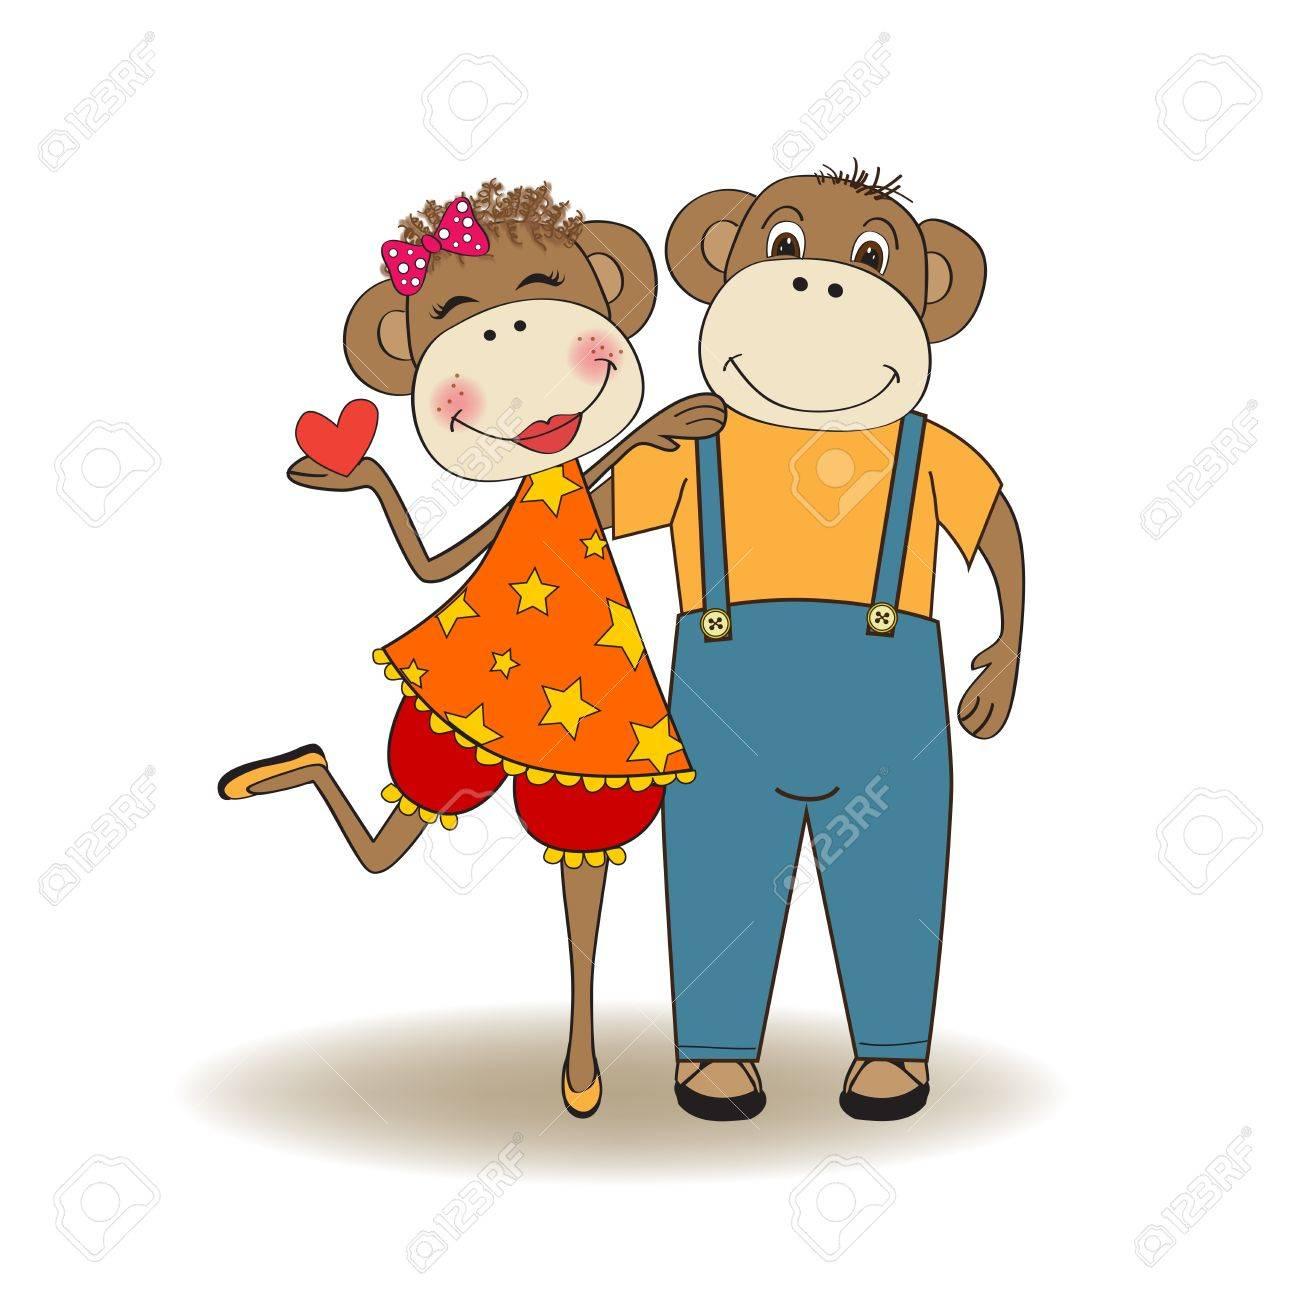 monkeys couple in love, Valentine's day card Stock Vector - 17671617